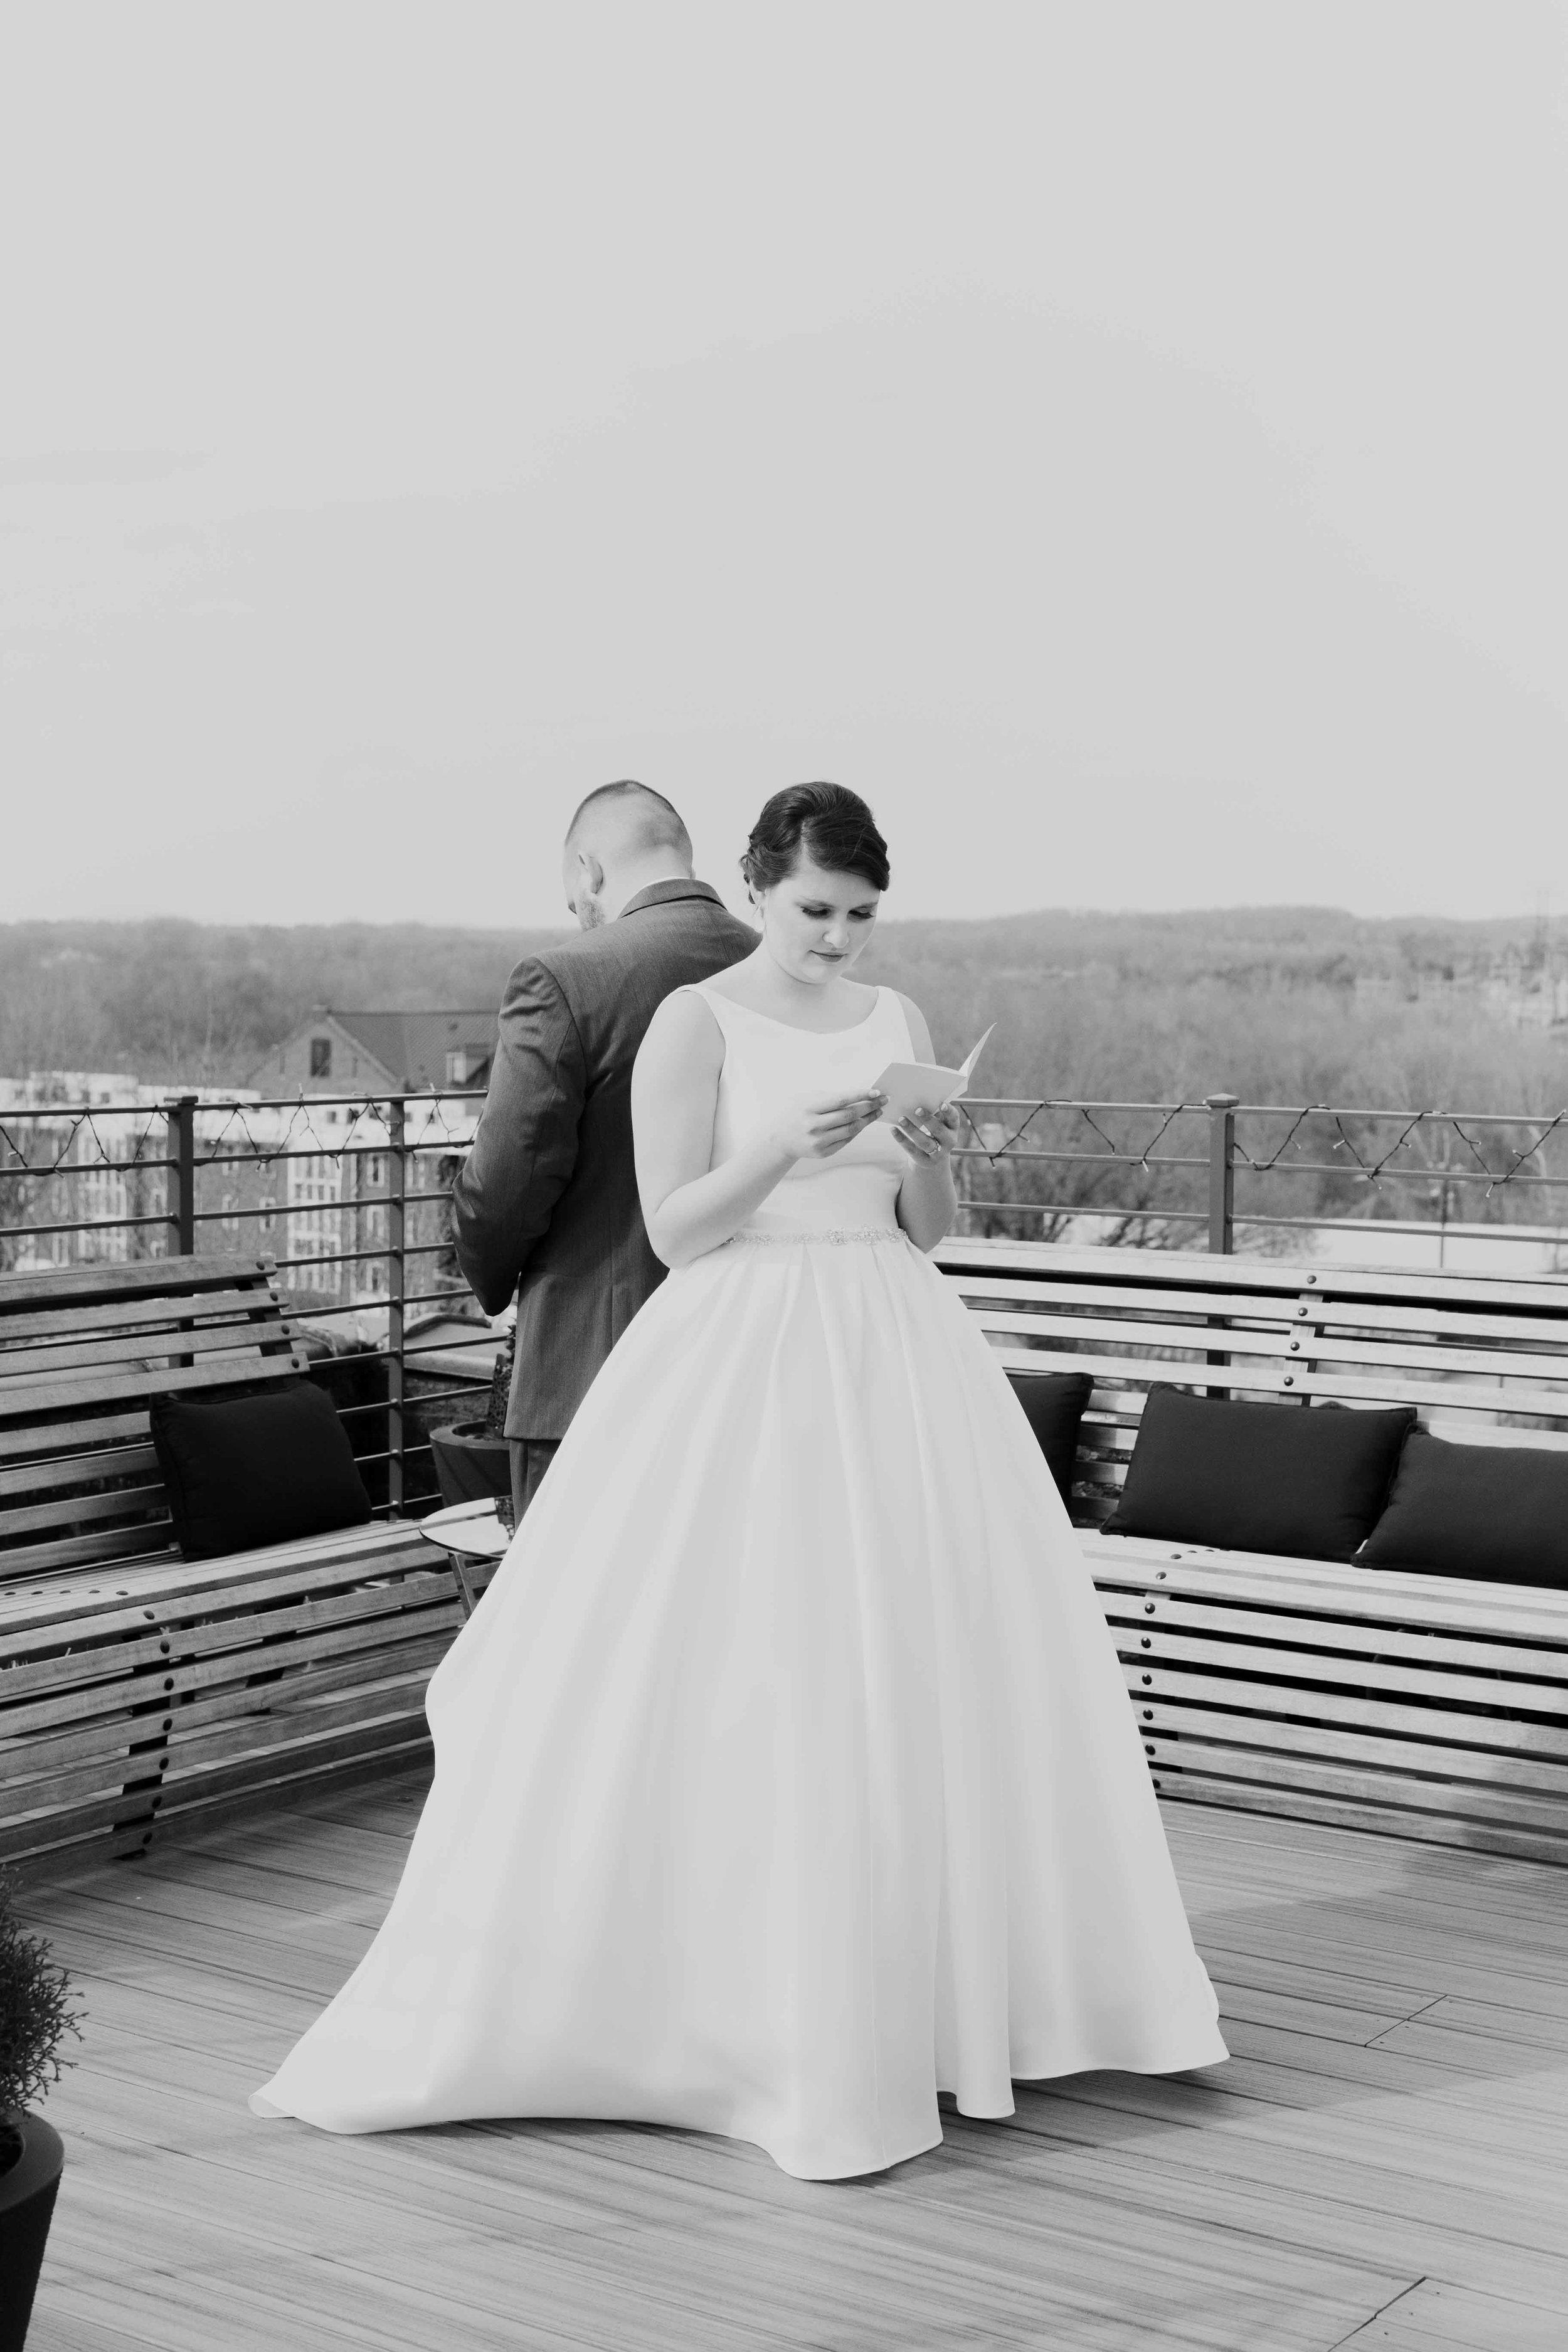 Farmville-Virginia-Wedding-Hotel-Weynoke-Downtown-Jacqueline-Waters-Photography-Detailed- (525).jpg